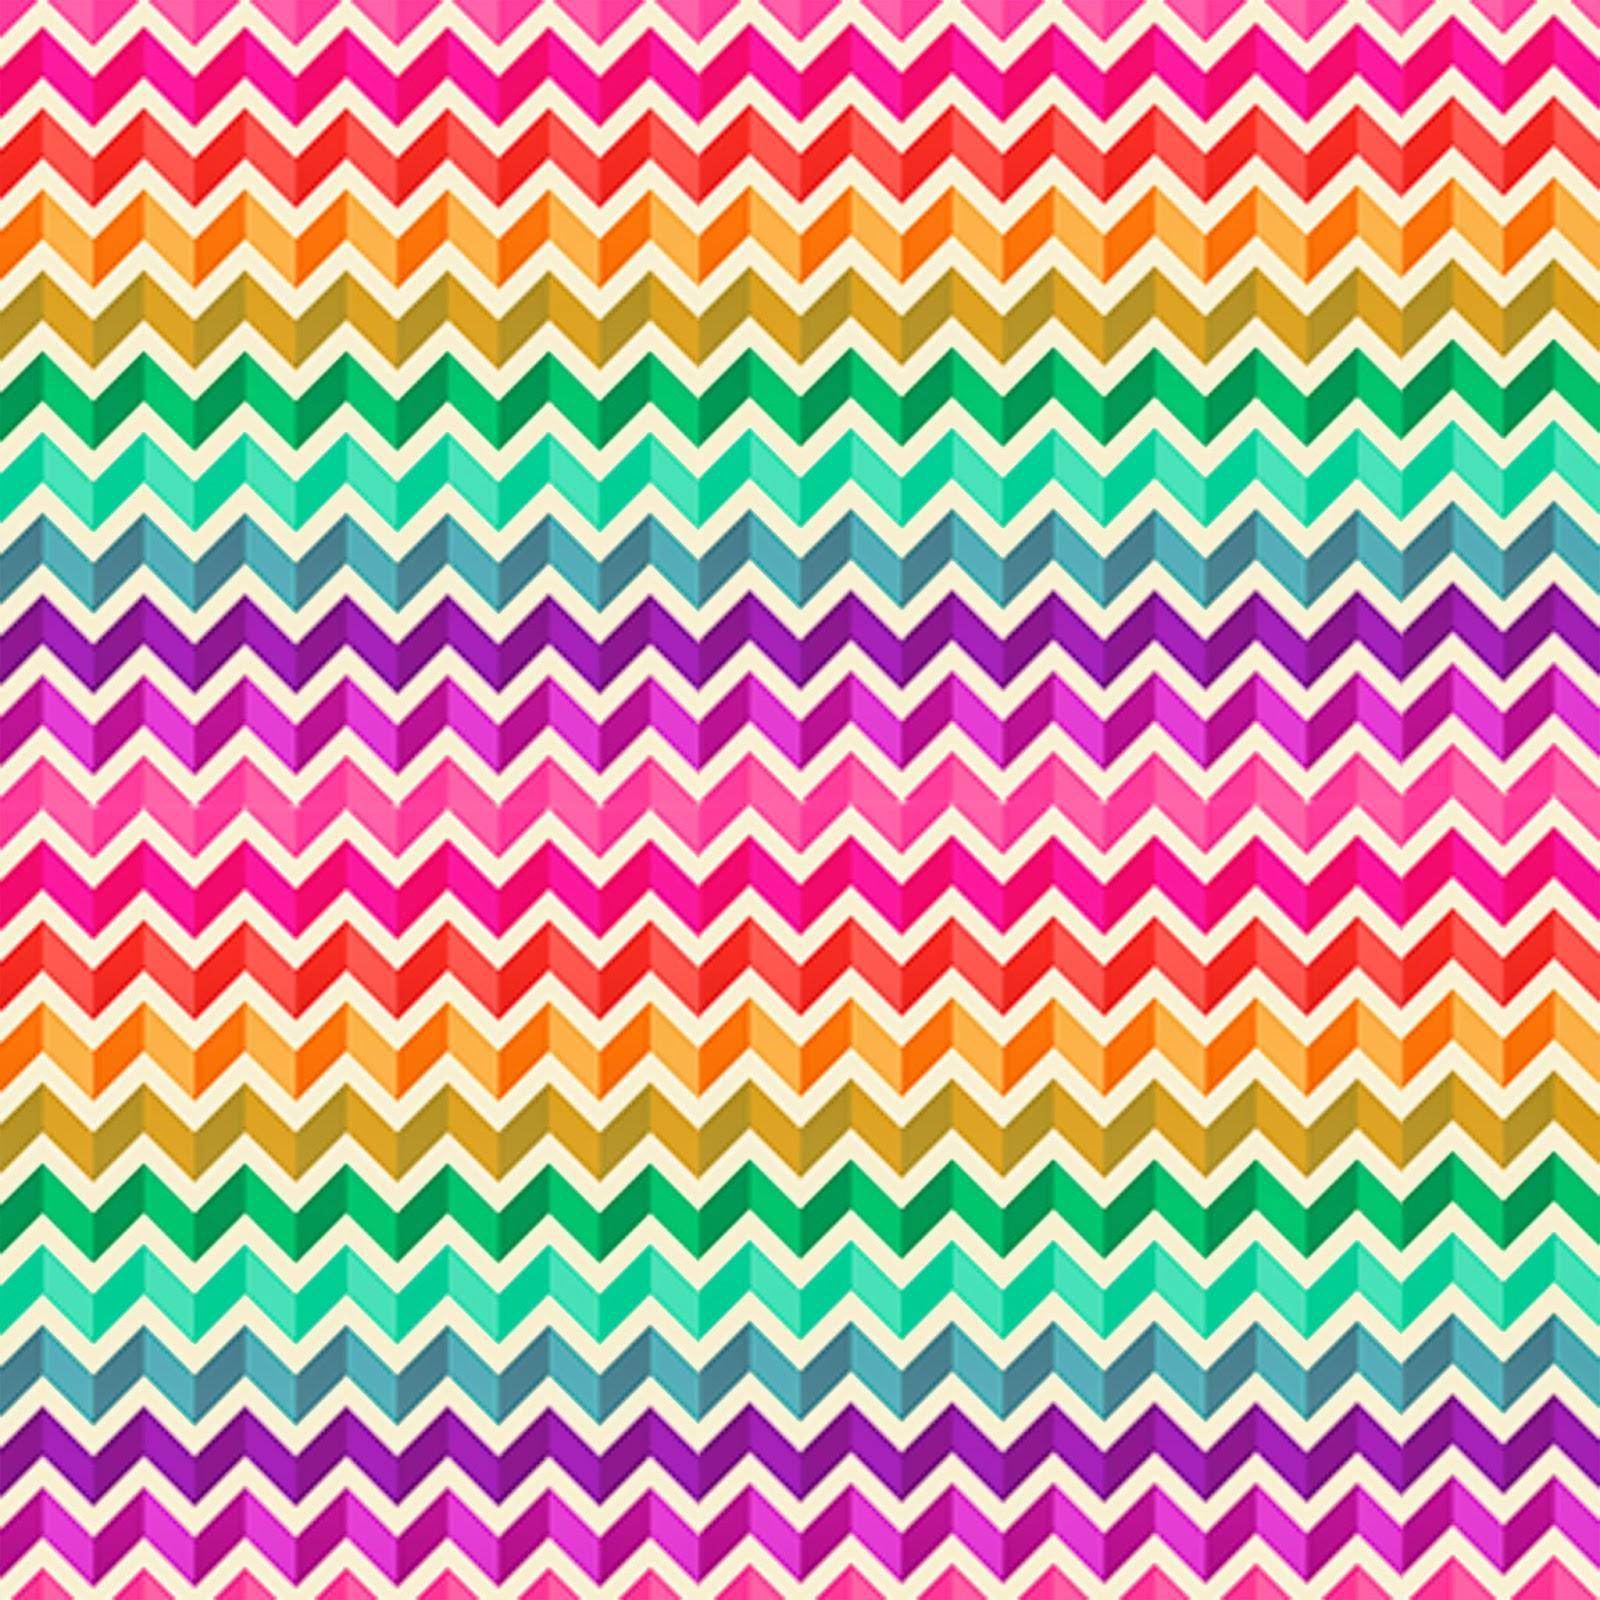 8 Colorful Block Chevron Freebie Printable Patterns